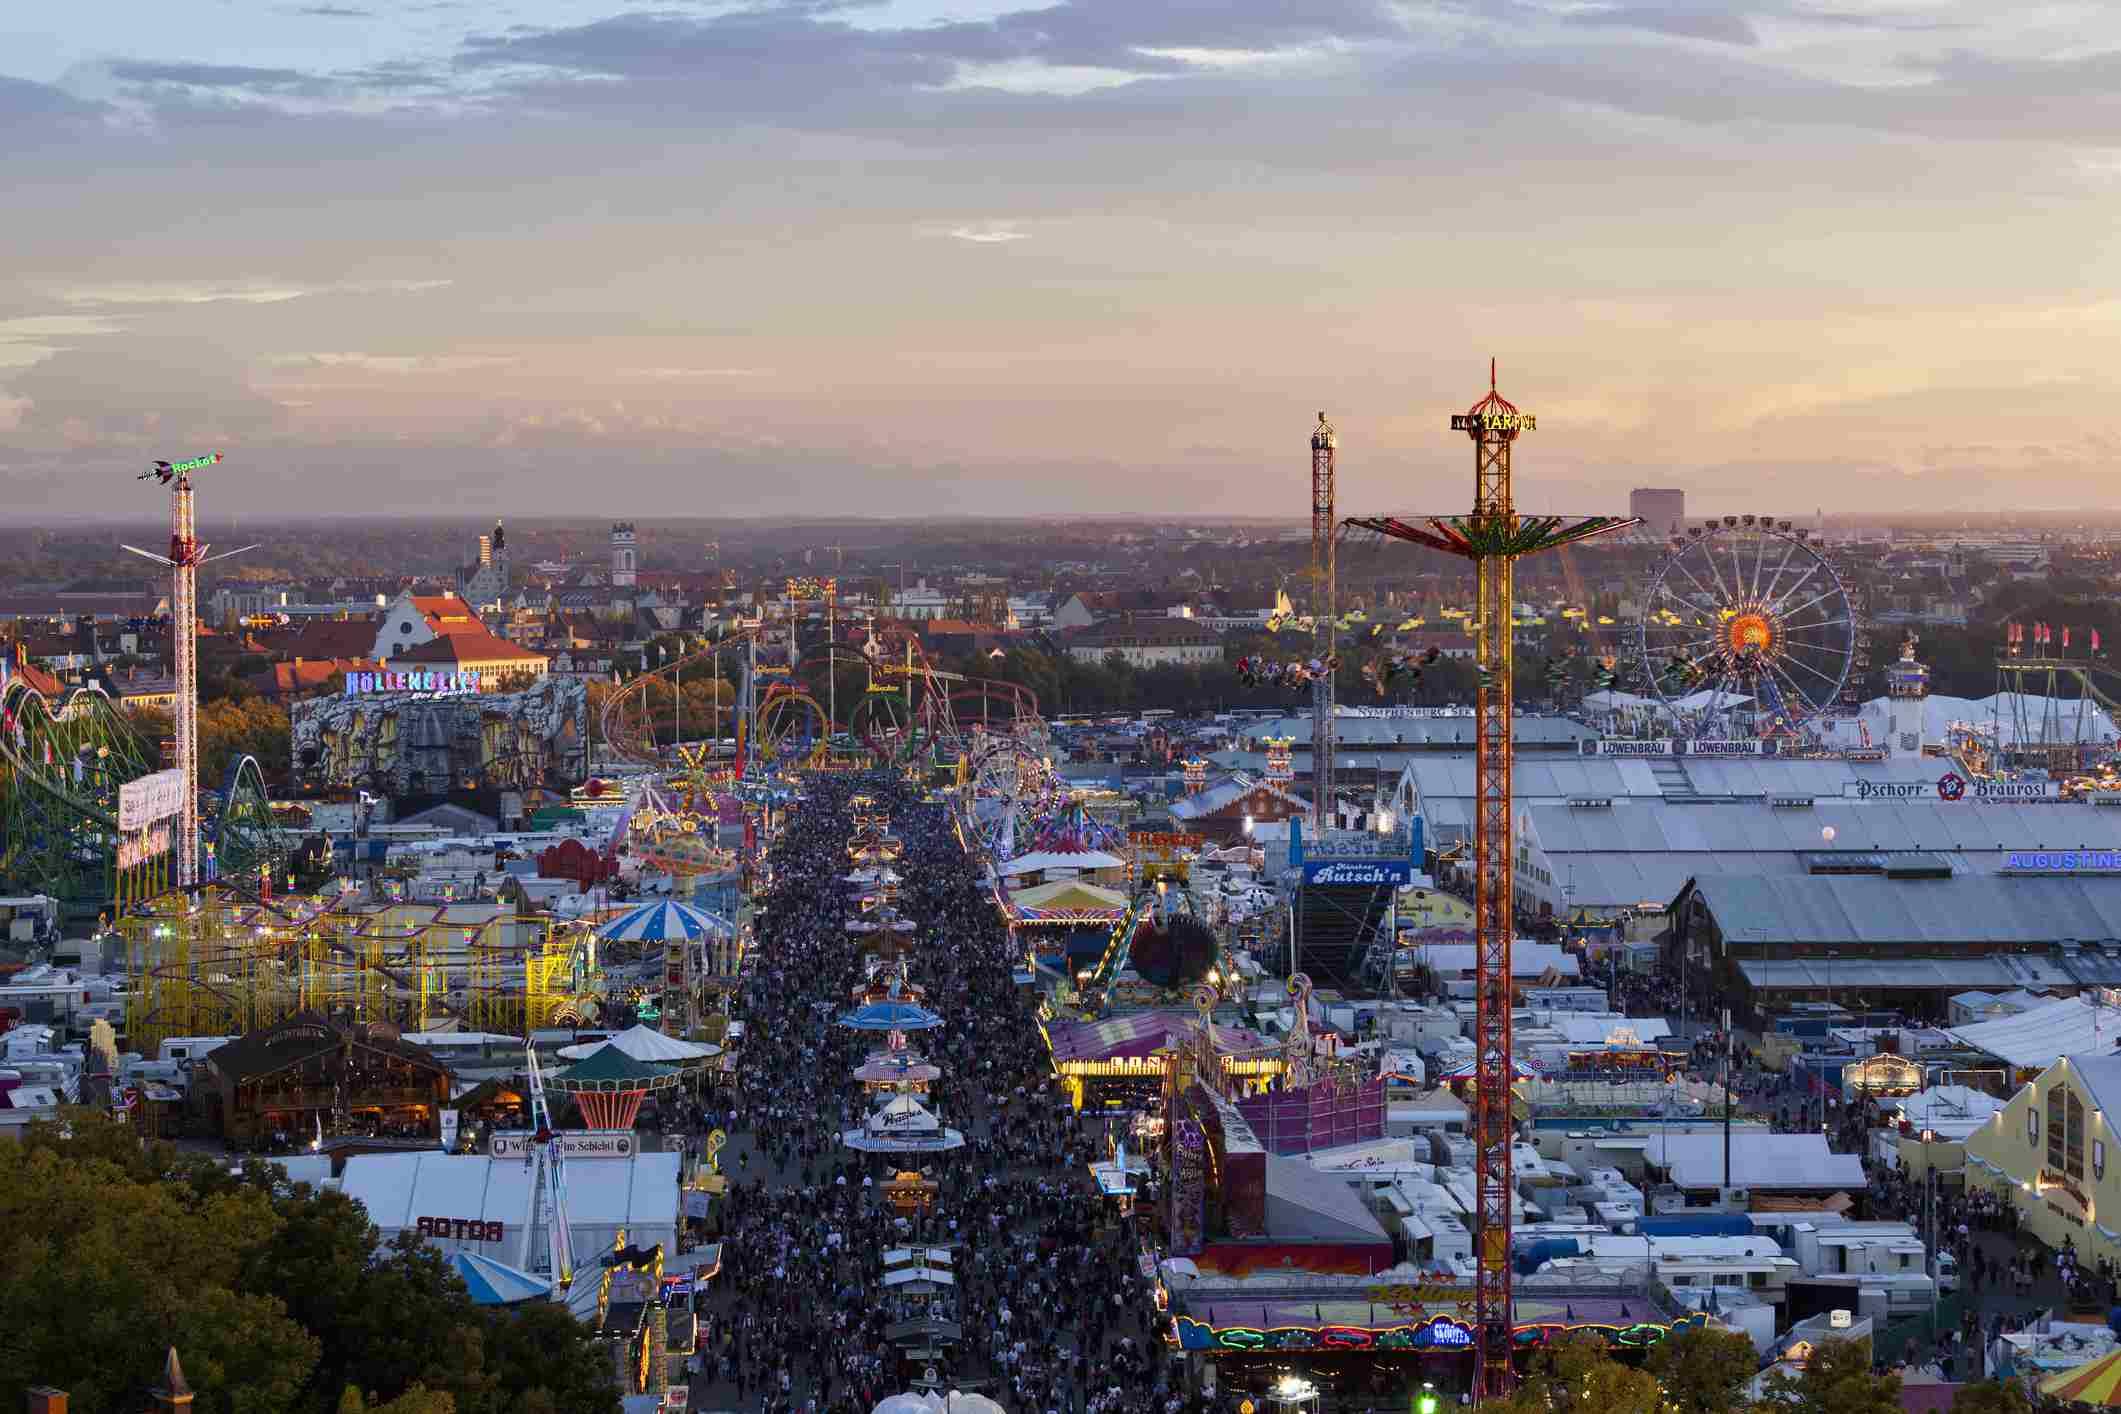 Munich, Germany, view of Oktoberfest fair at dusk